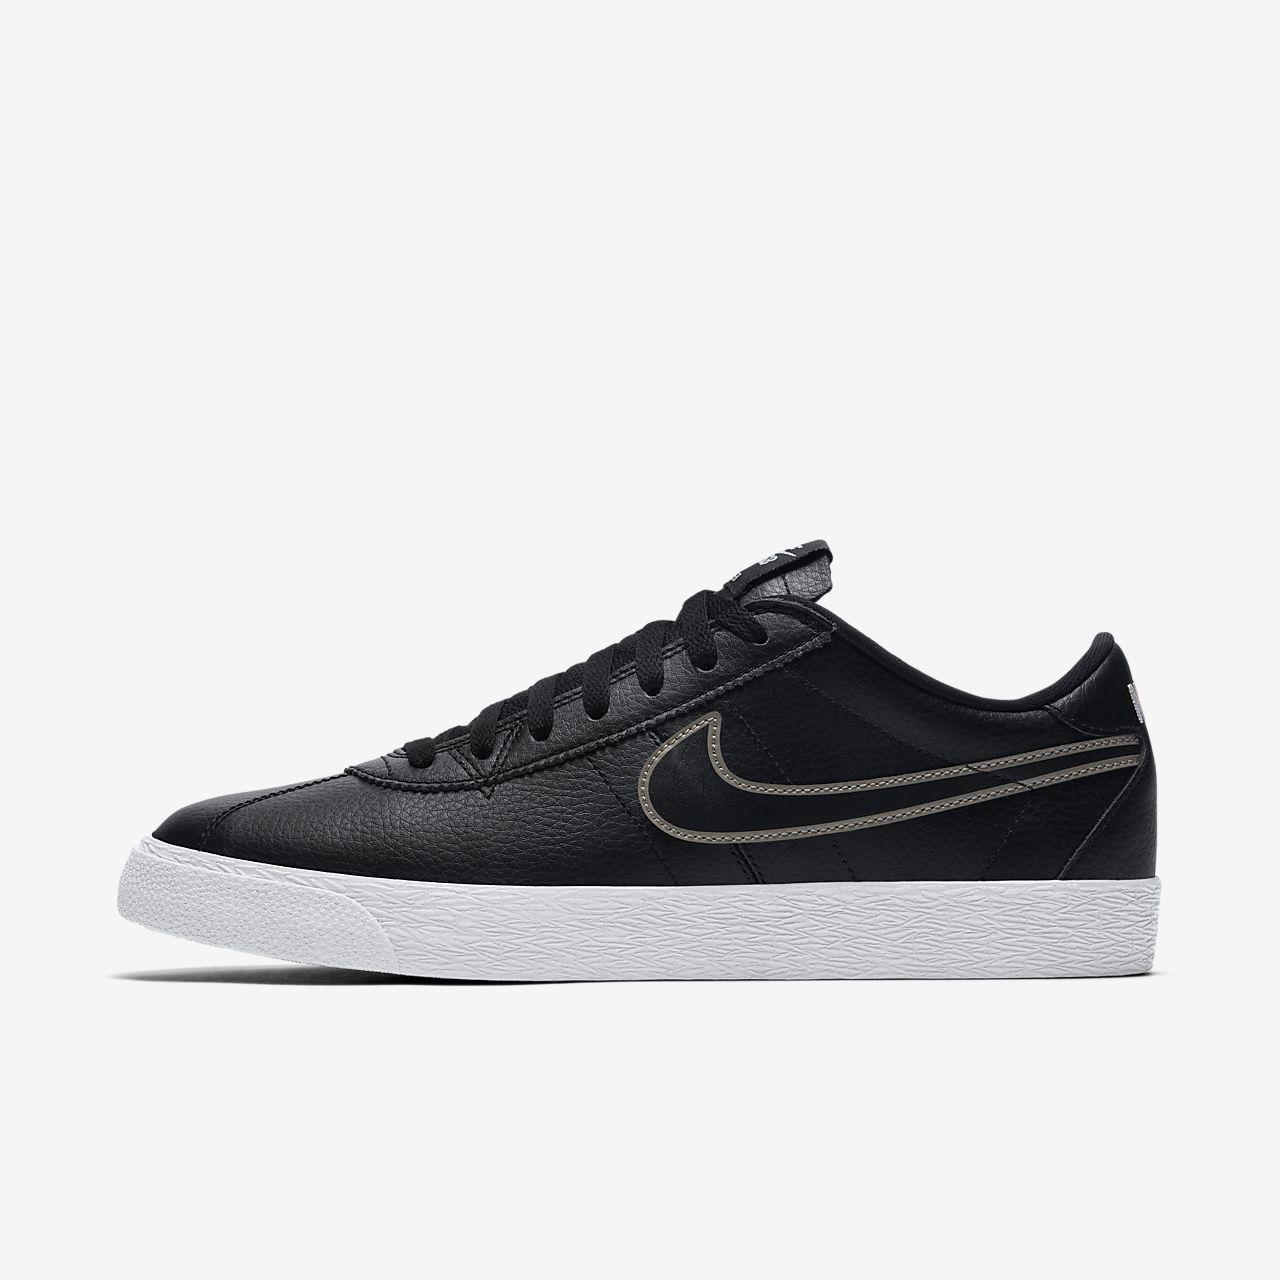 899ec8d1d1c8c ... black  nike sb zoom bruin premium se mens skateboarding shoe